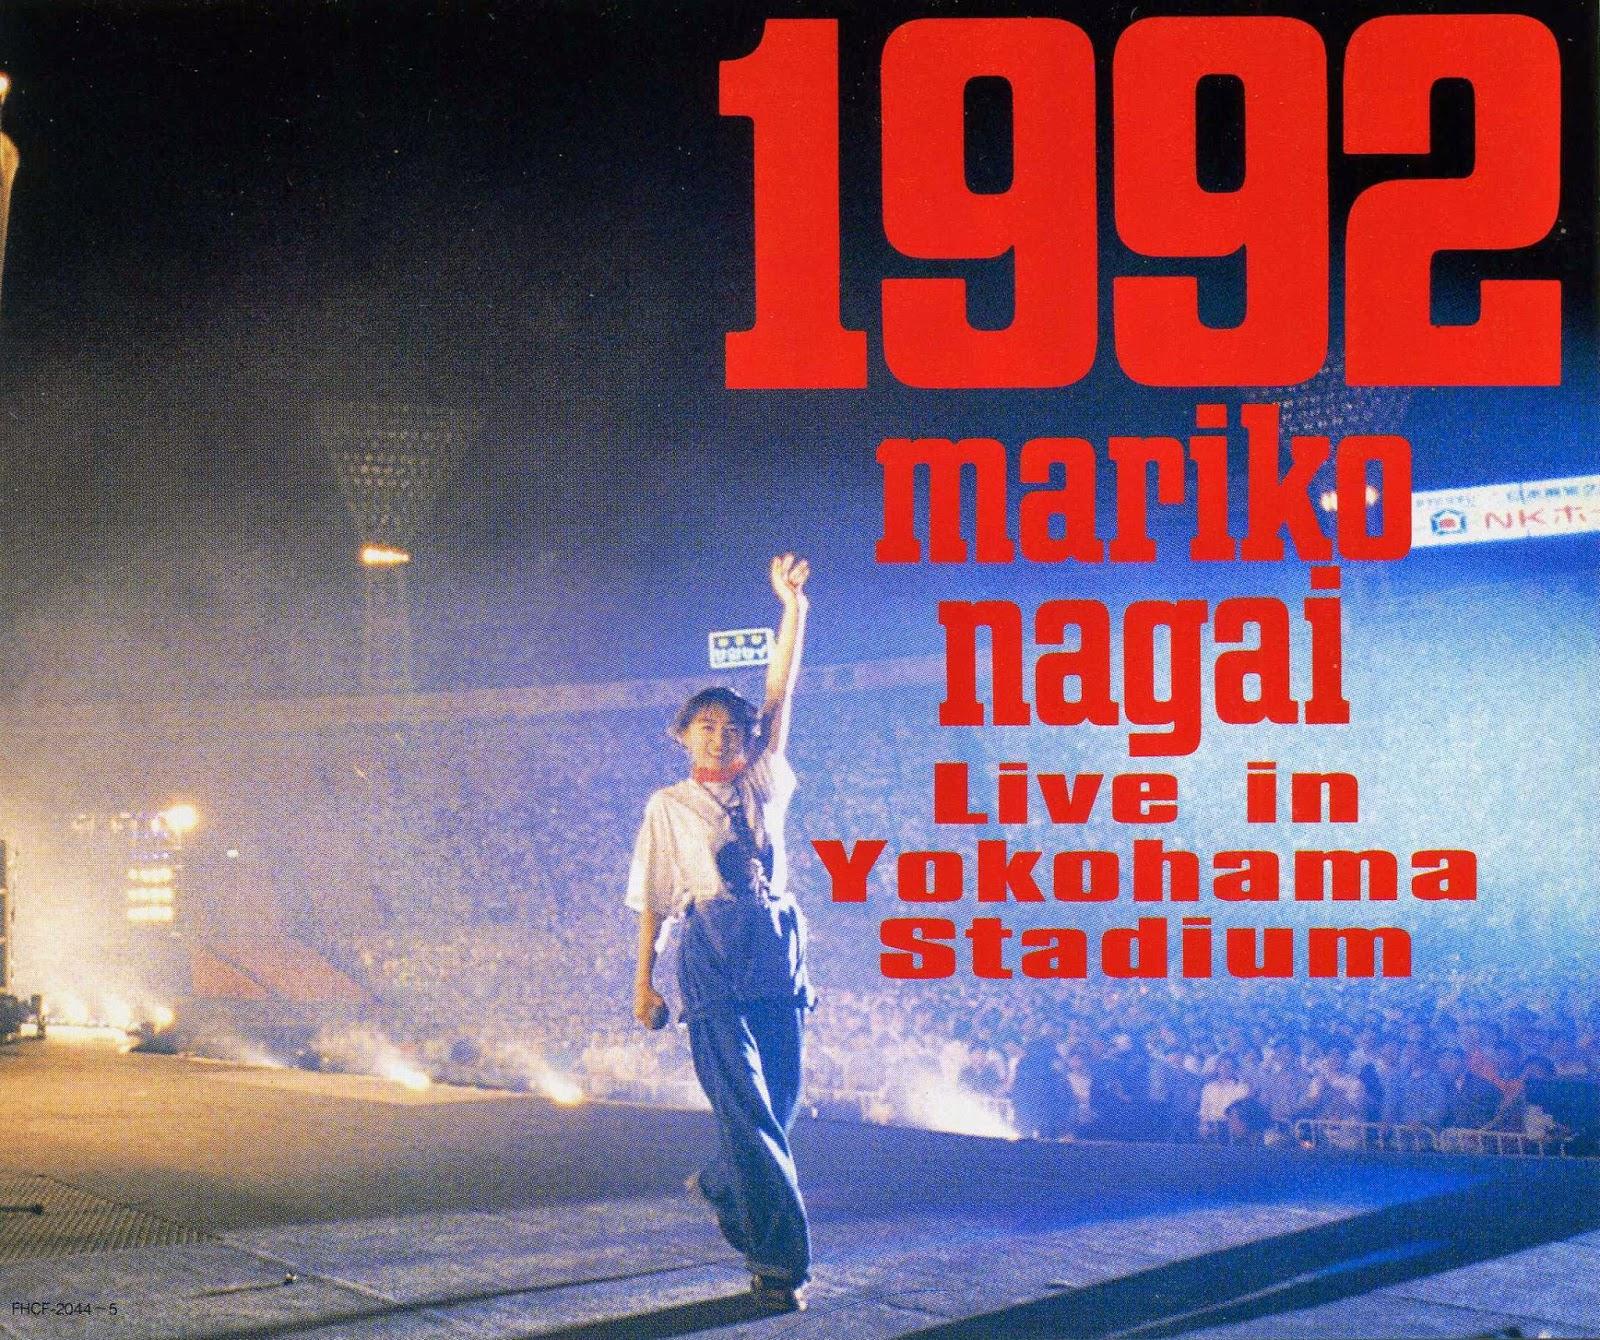 Mariko Nagai - 1992 - Live In Yokohama Stadium